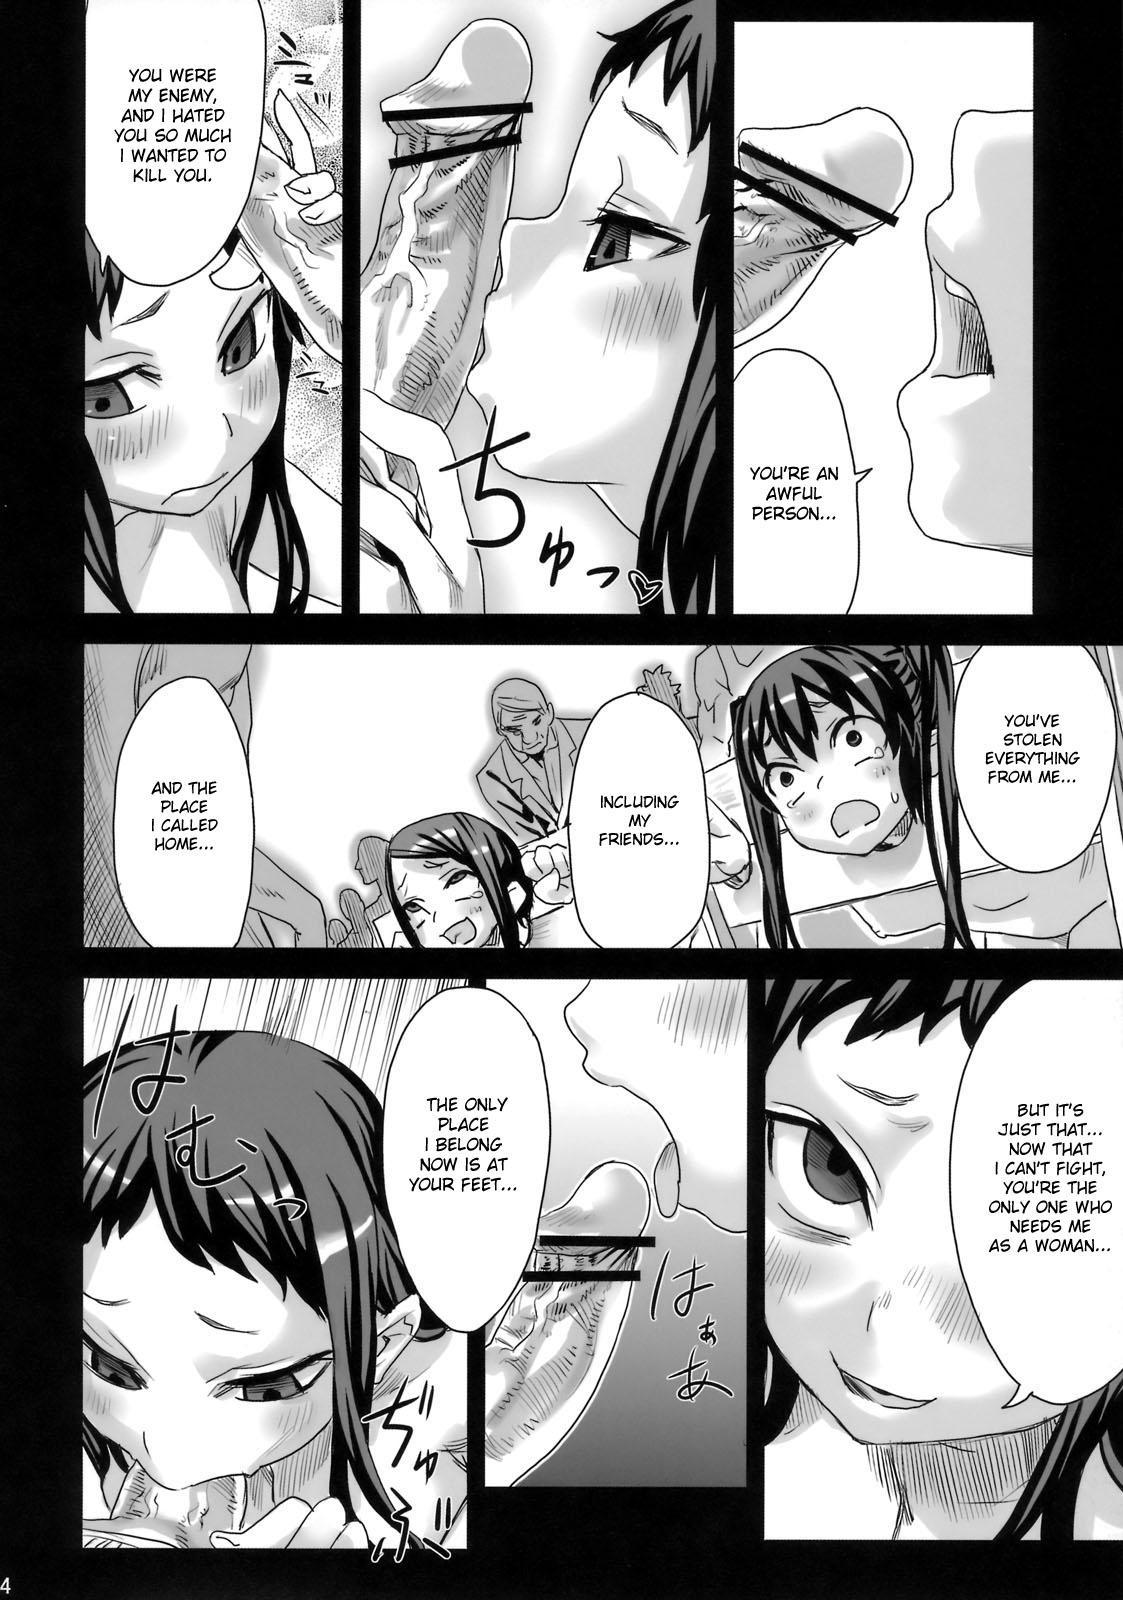 (C76) [Fatalpulse (Asanagi)] Victim Girls 7 - Jaku Niku Kyoushoku Dog-eat-Bitch (Fantasy Earth Zero) [English] [desudesu] 32